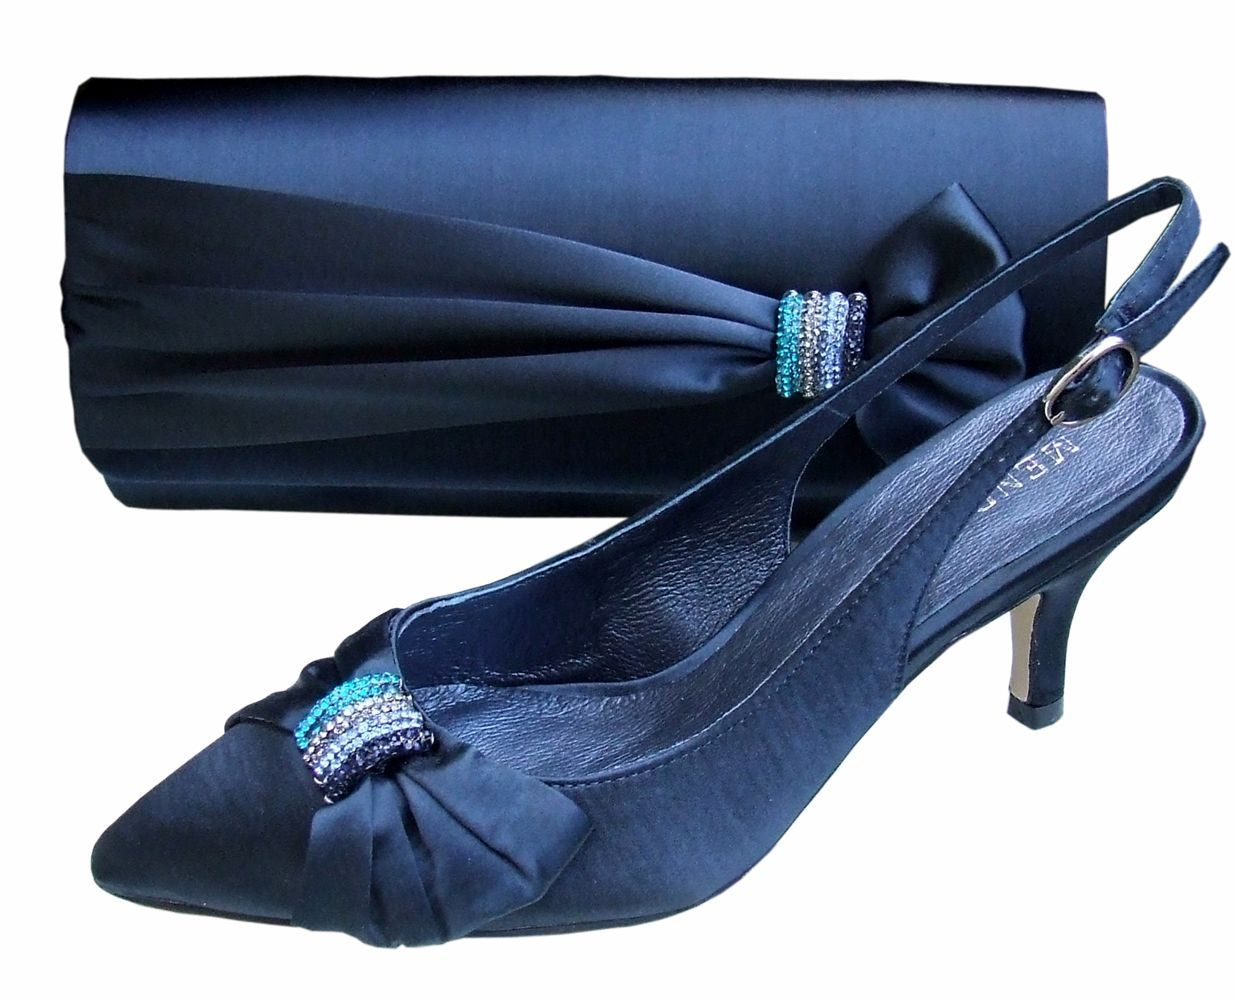 Ladies menbur navy satin u diamante low heel shoe shoes